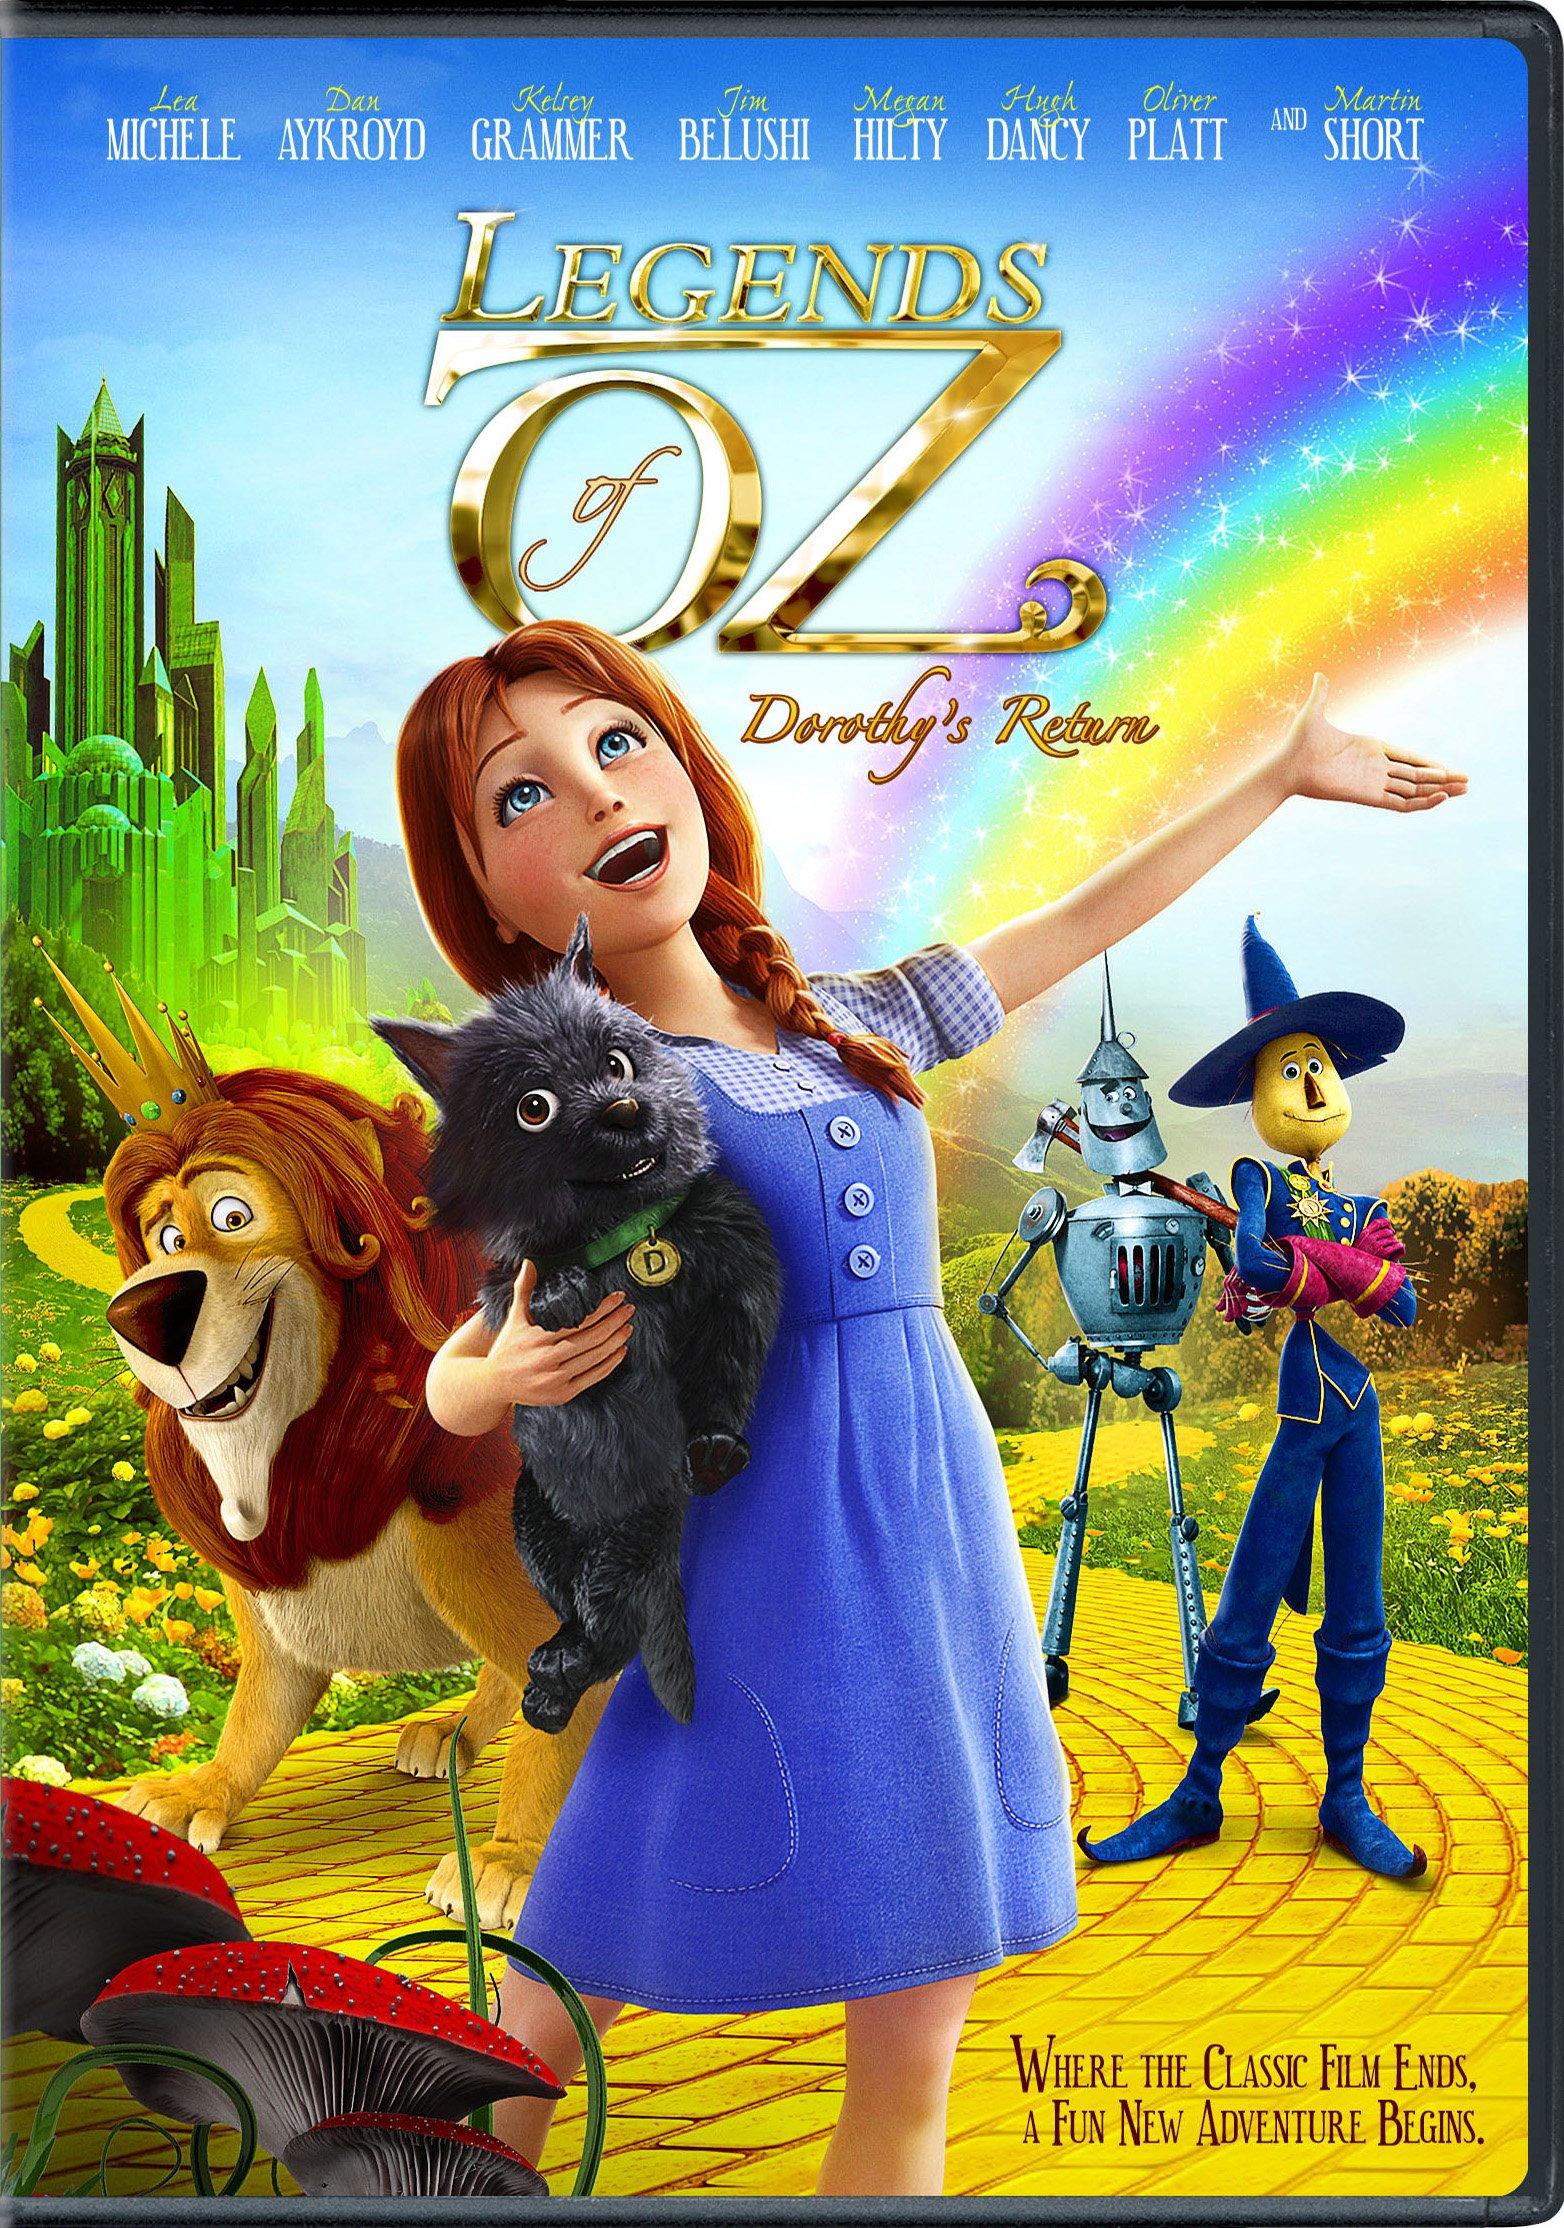 Legends of Oz: Dorothy's Return DVD Cover